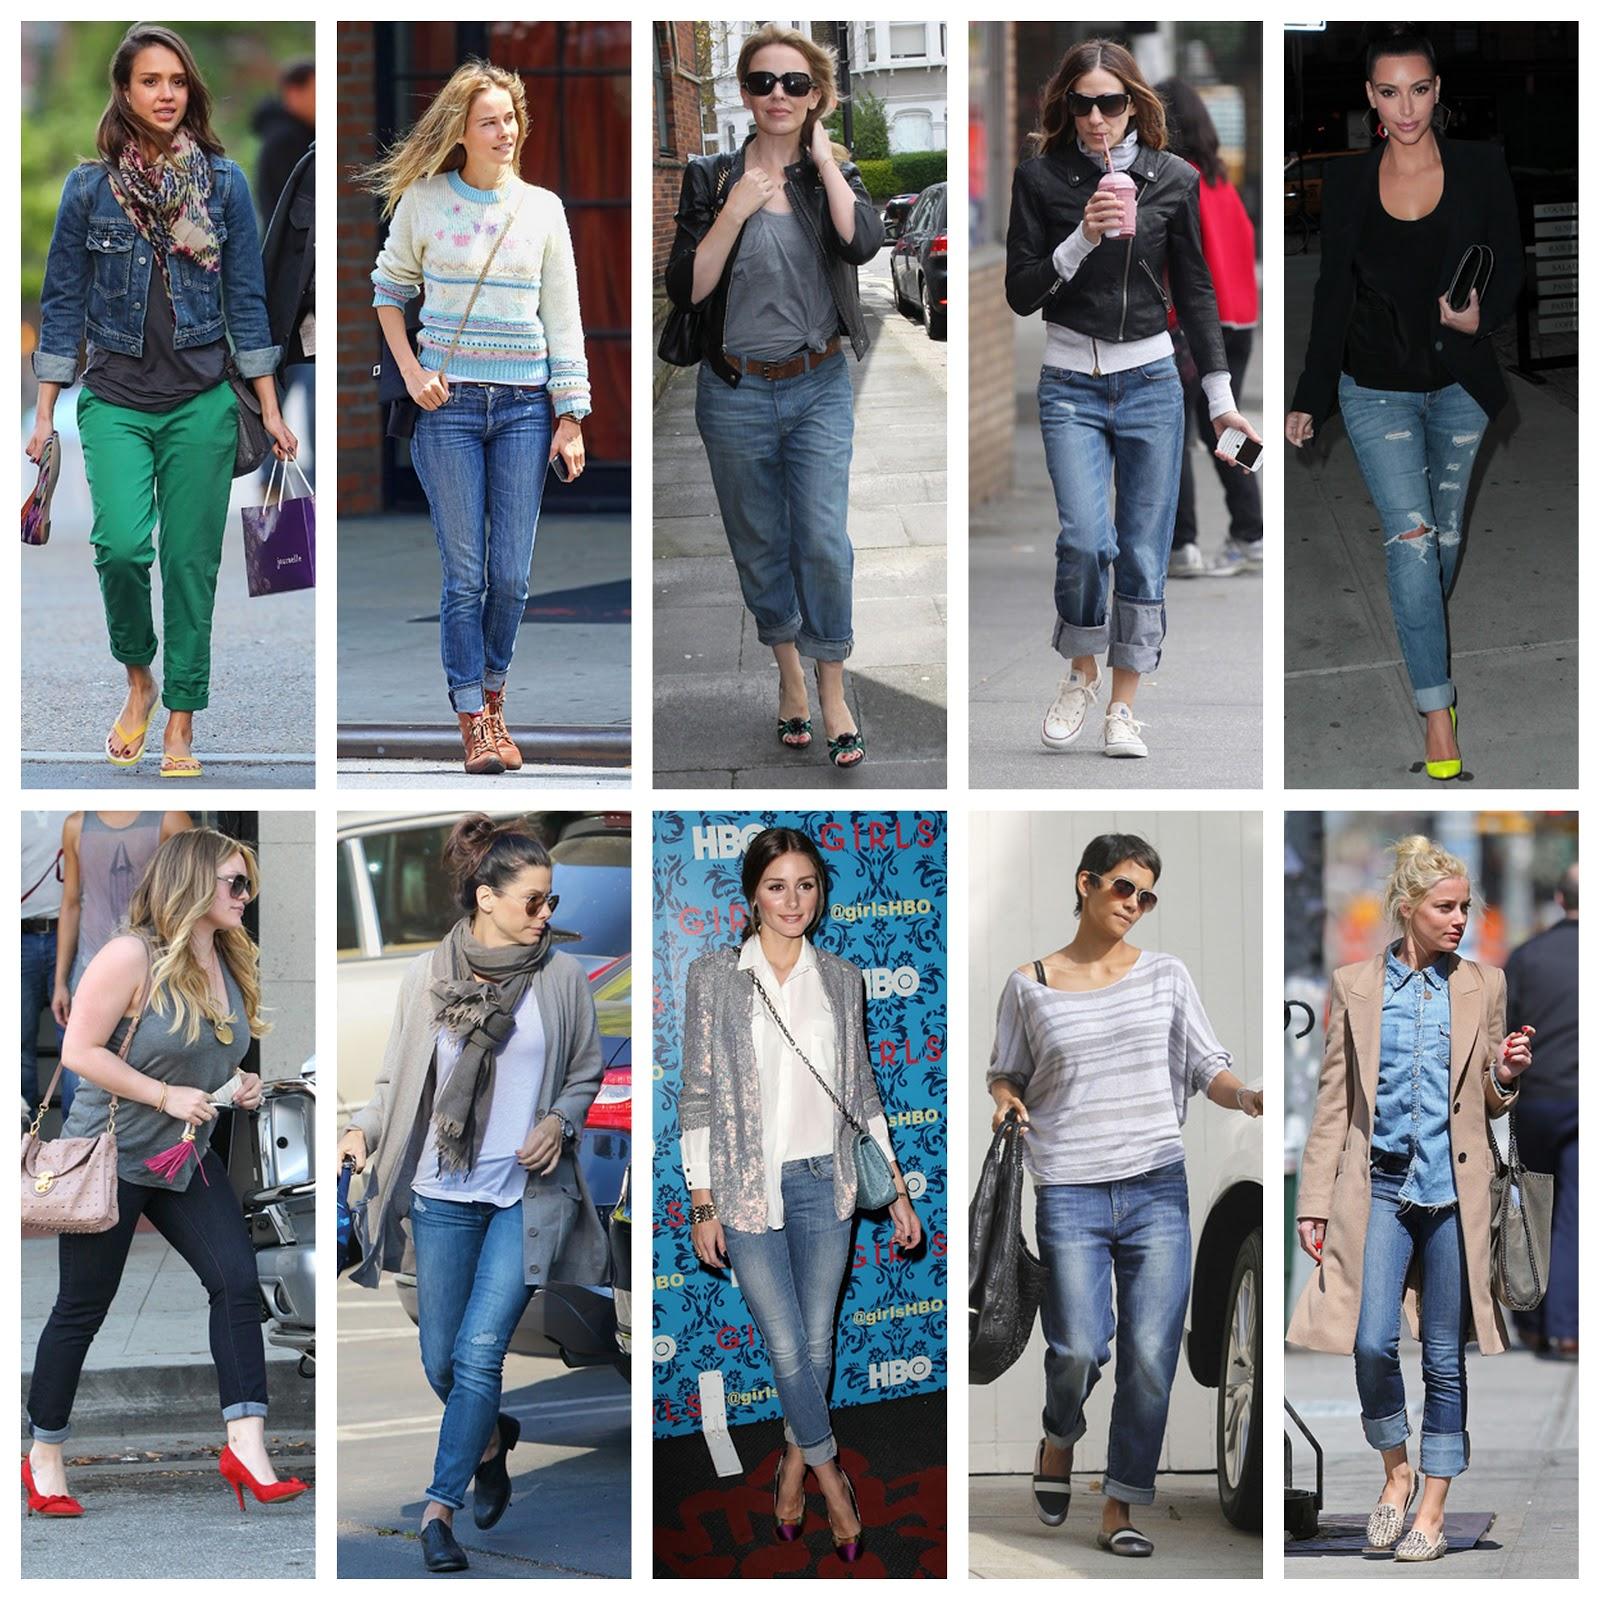 http://1.bp.blogspot.com/-F9rudepFKiY/T61ltbHbbNI/AAAAAAAAJkM/oVemGrmnvds/s1600/Pantalones+remangados.jpg